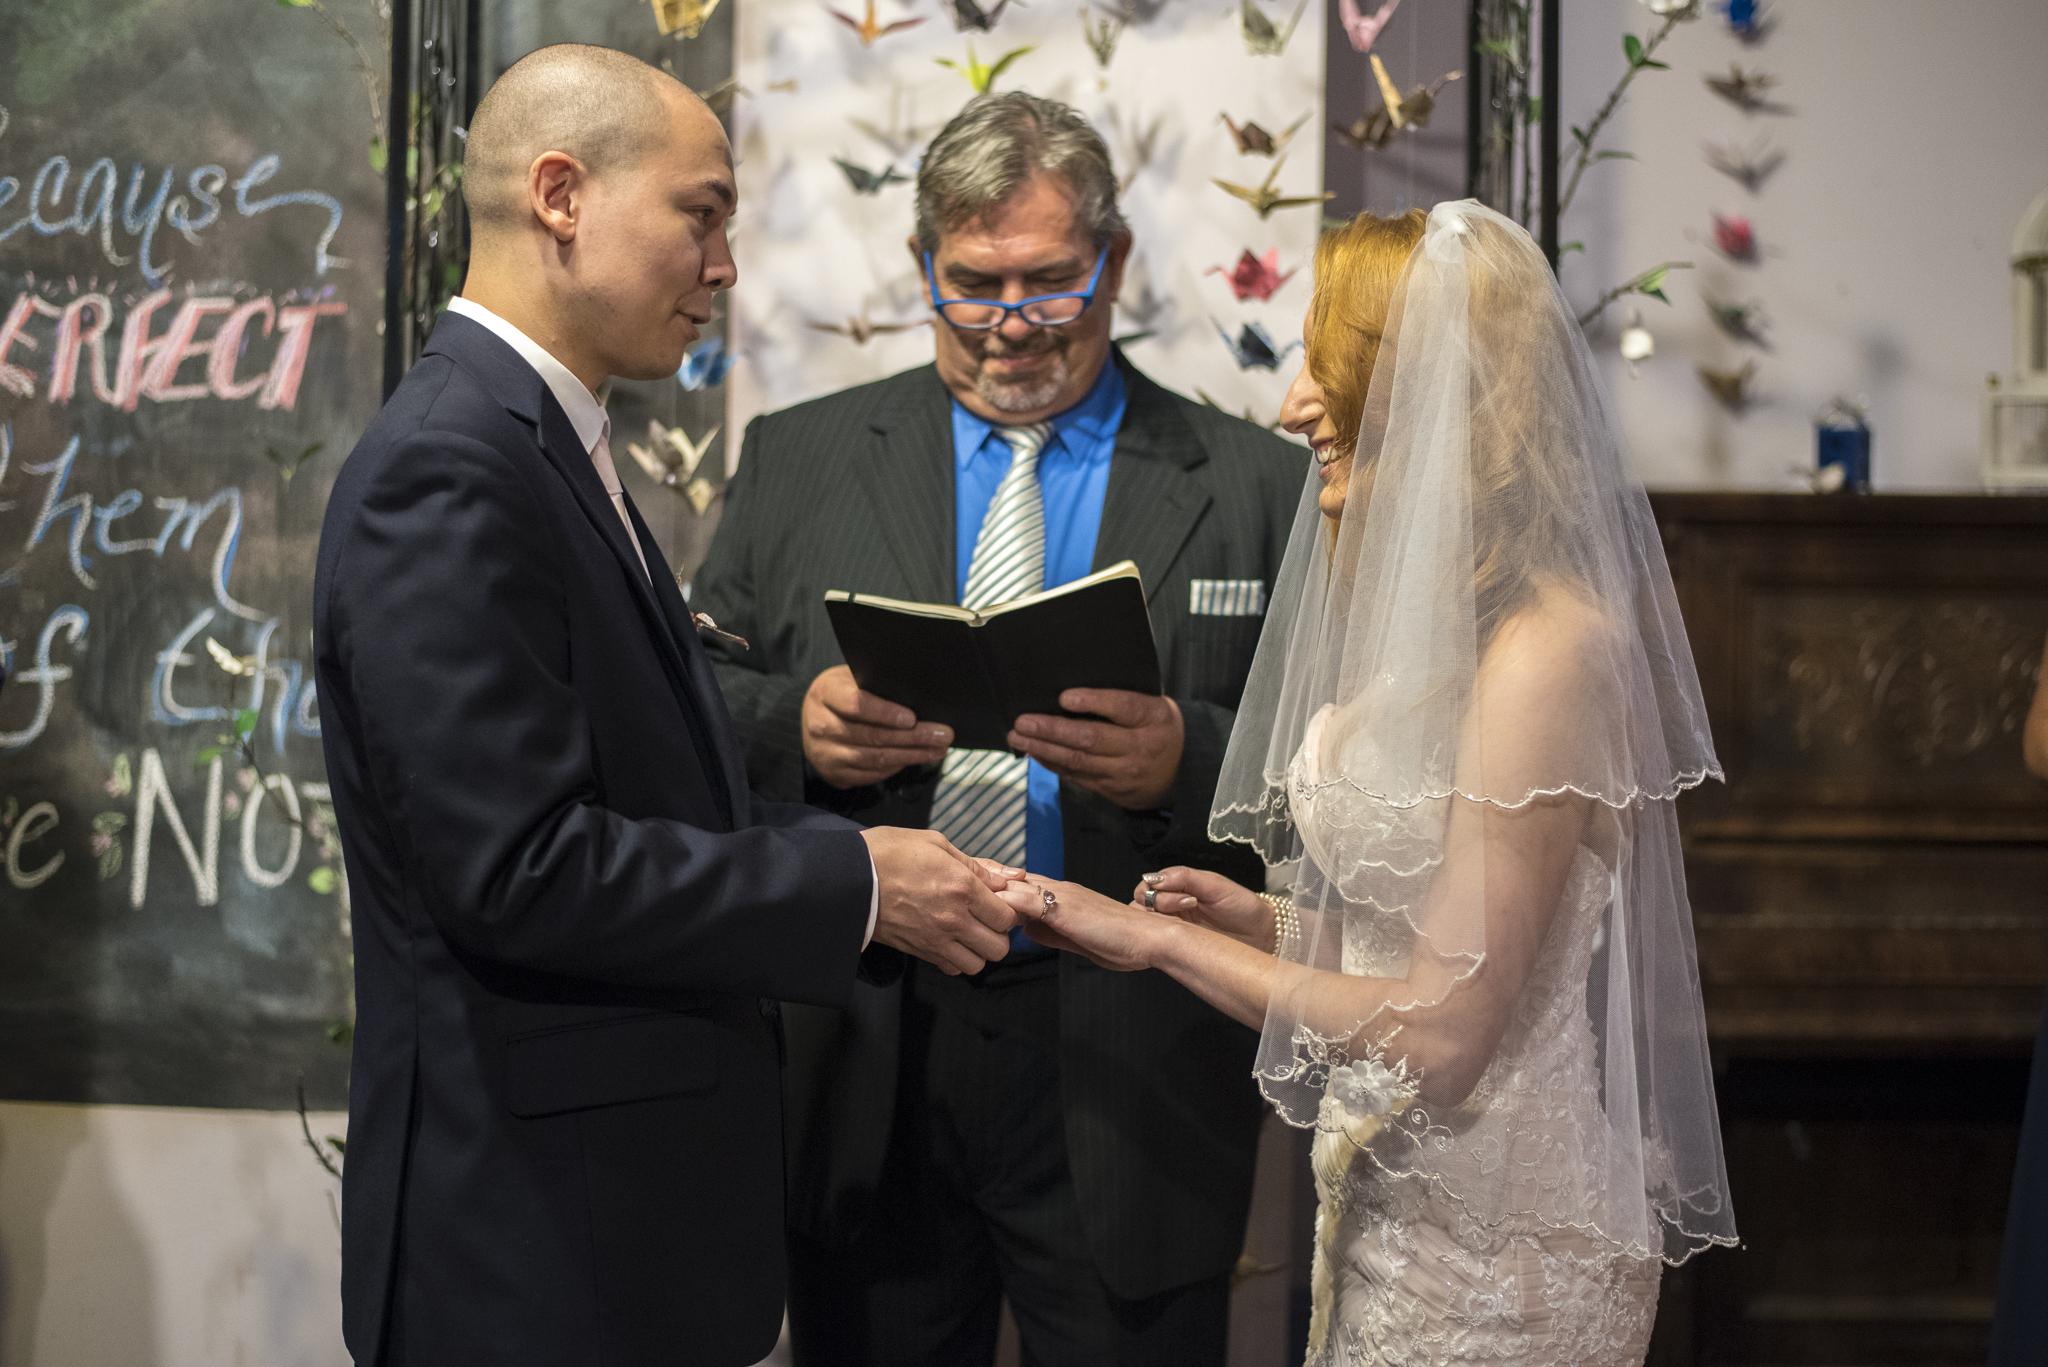 Melissa-Lance-Online-Ceremony-8666.jpg